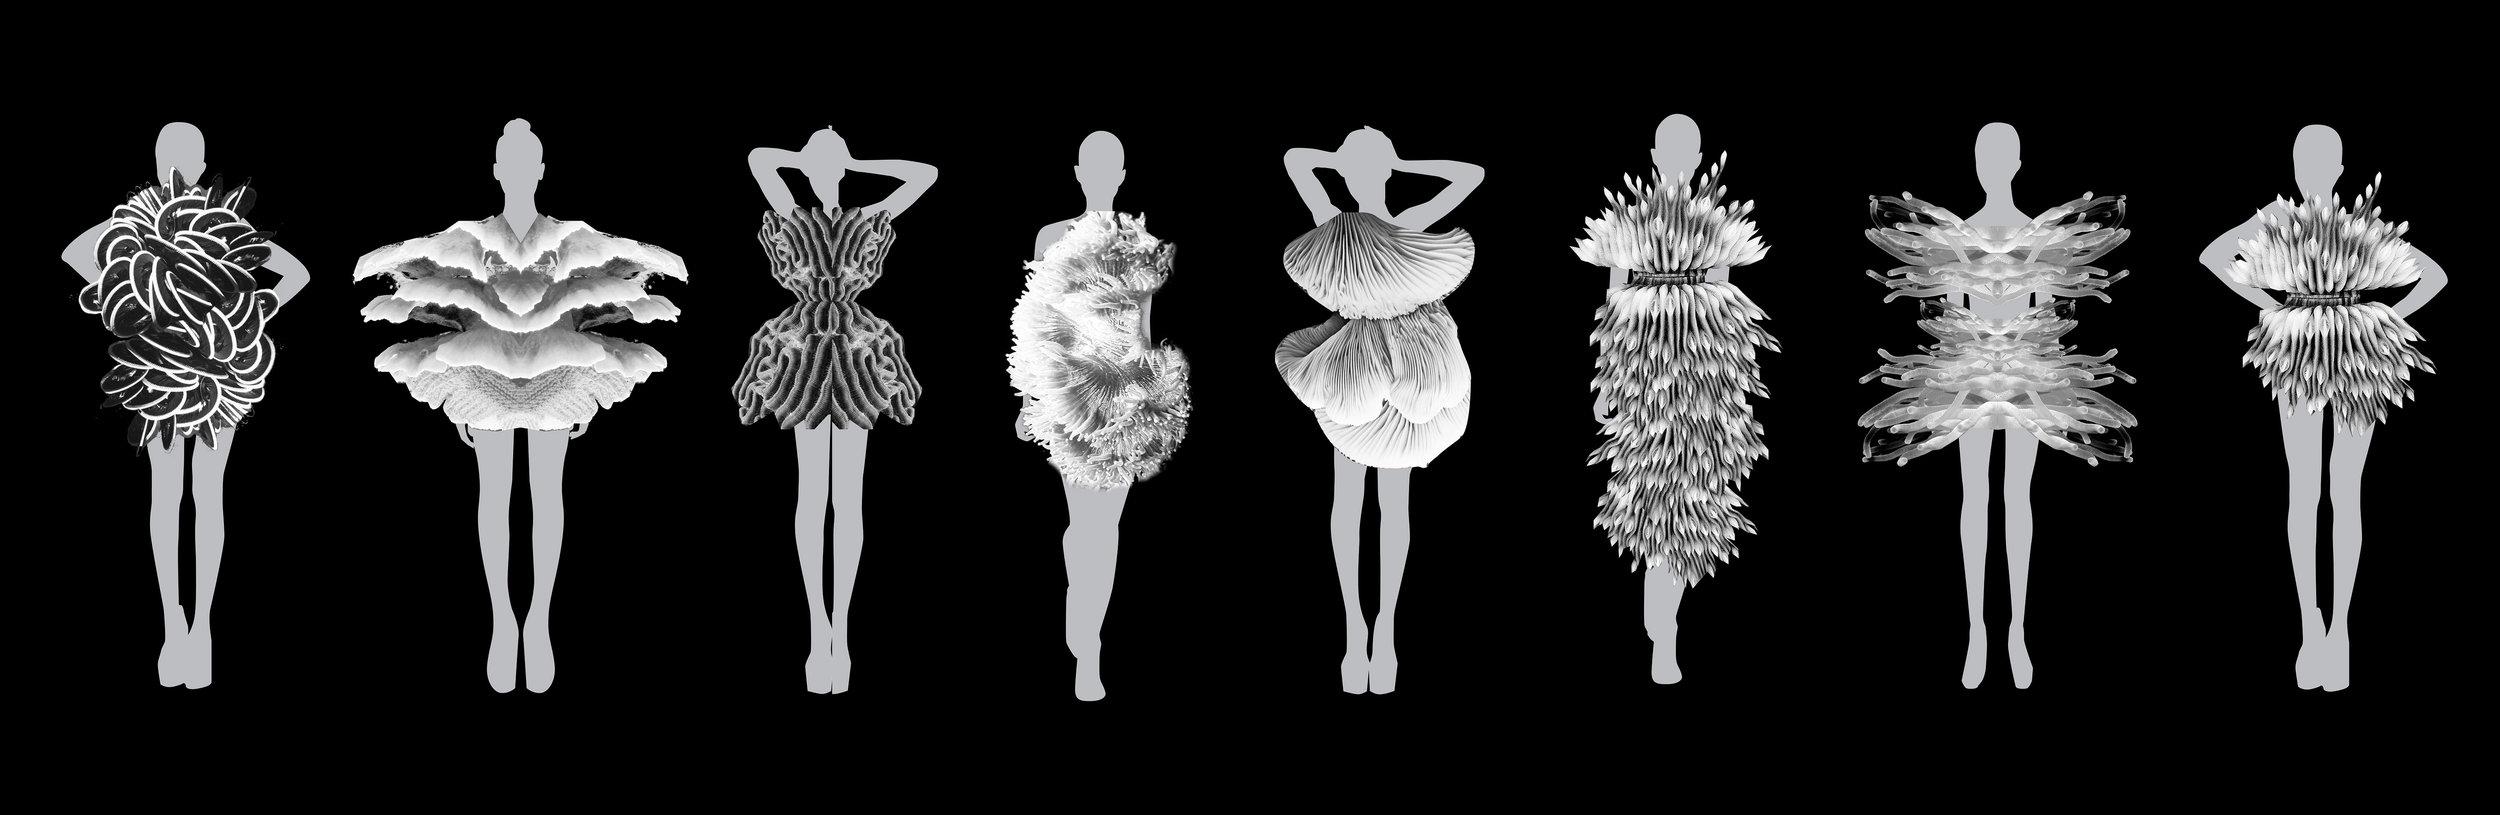 Reefstone garment sketches.